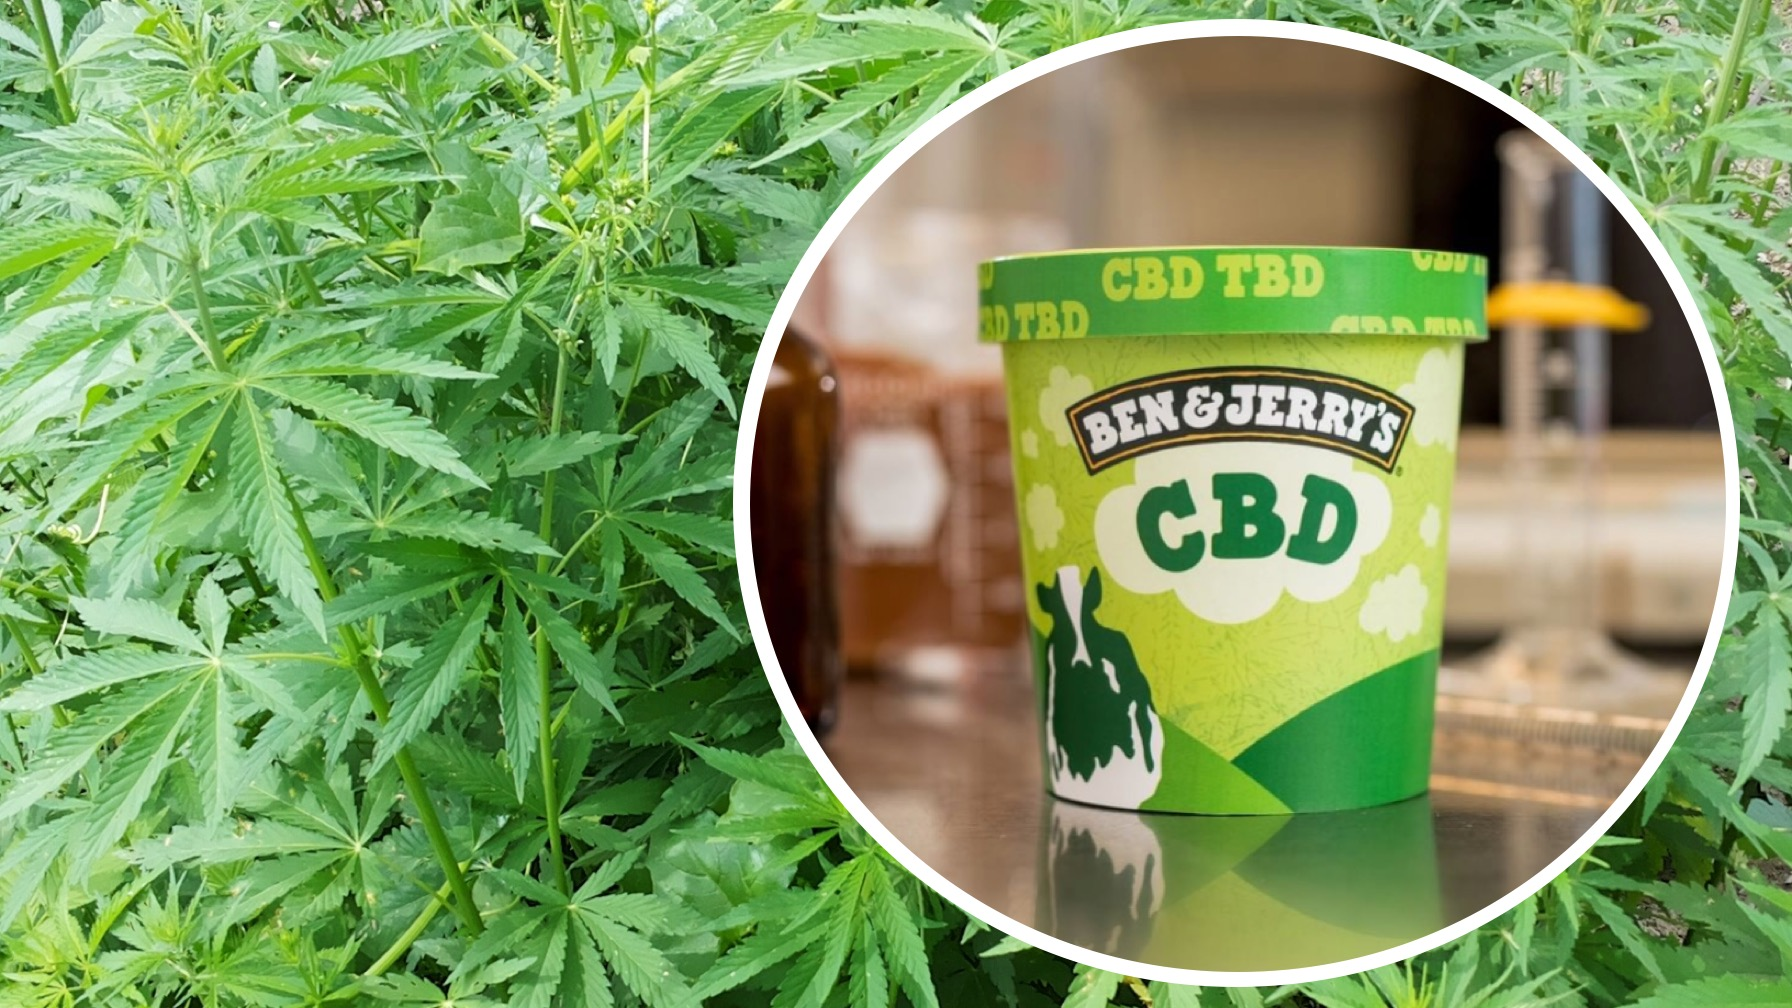 Ben & Jerry's Is Teasing Us With CBD Ice Cream